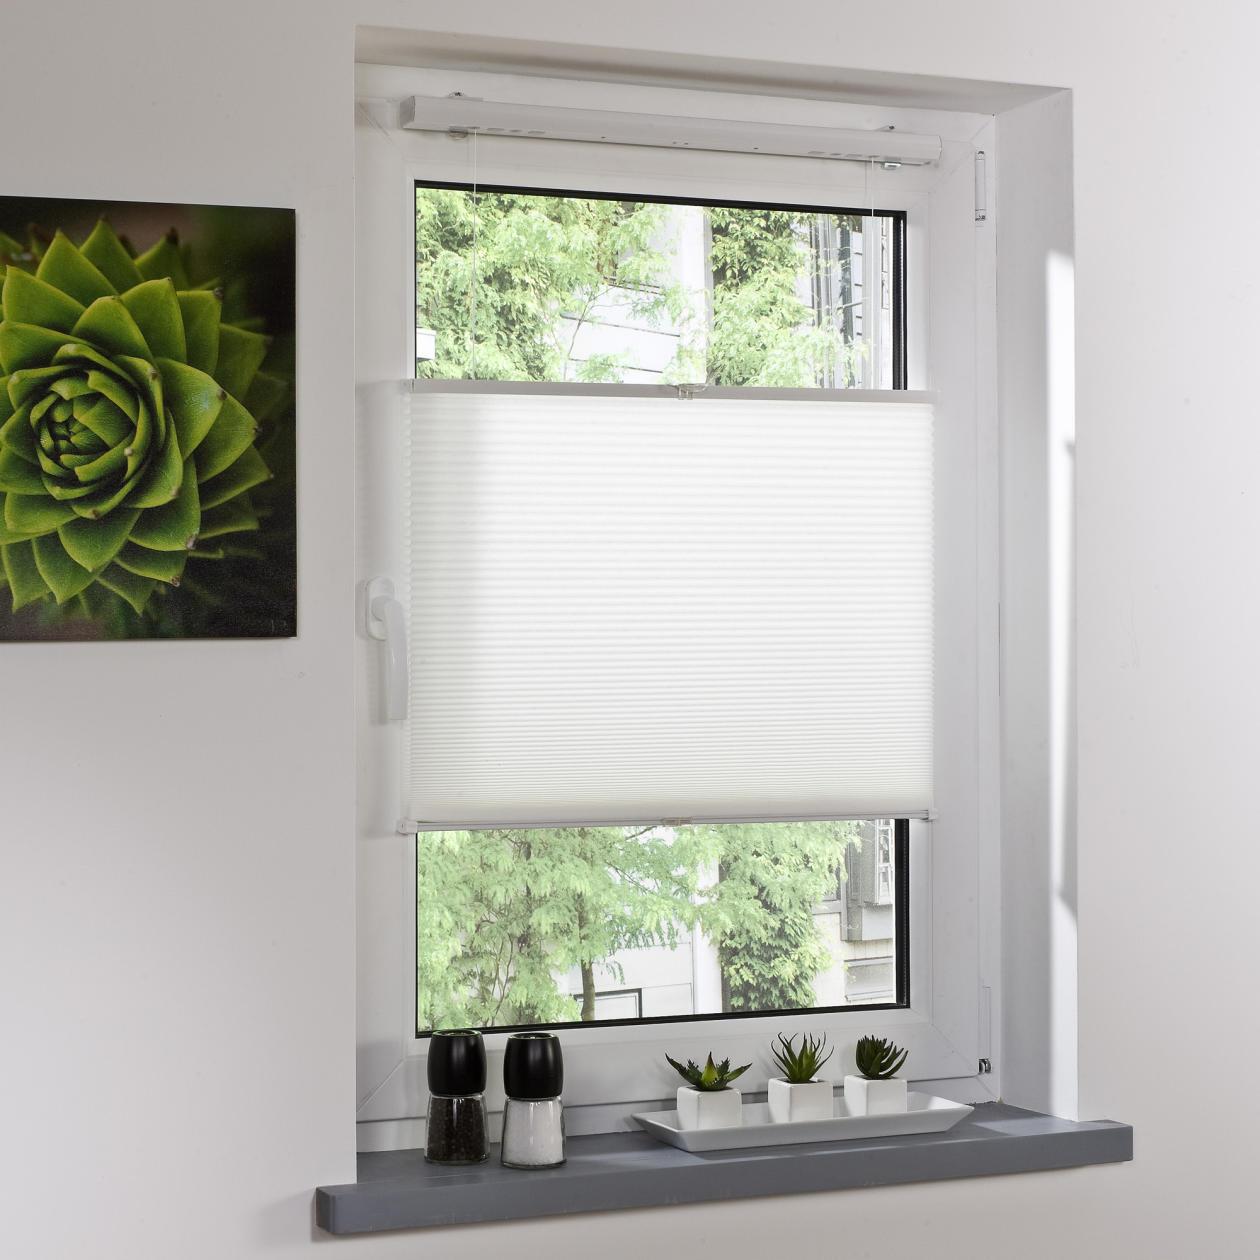 plissee klemmfix thermo ohne bohren lichblick shop. Black Bedroom Furniture Sets. Home Design Ideas